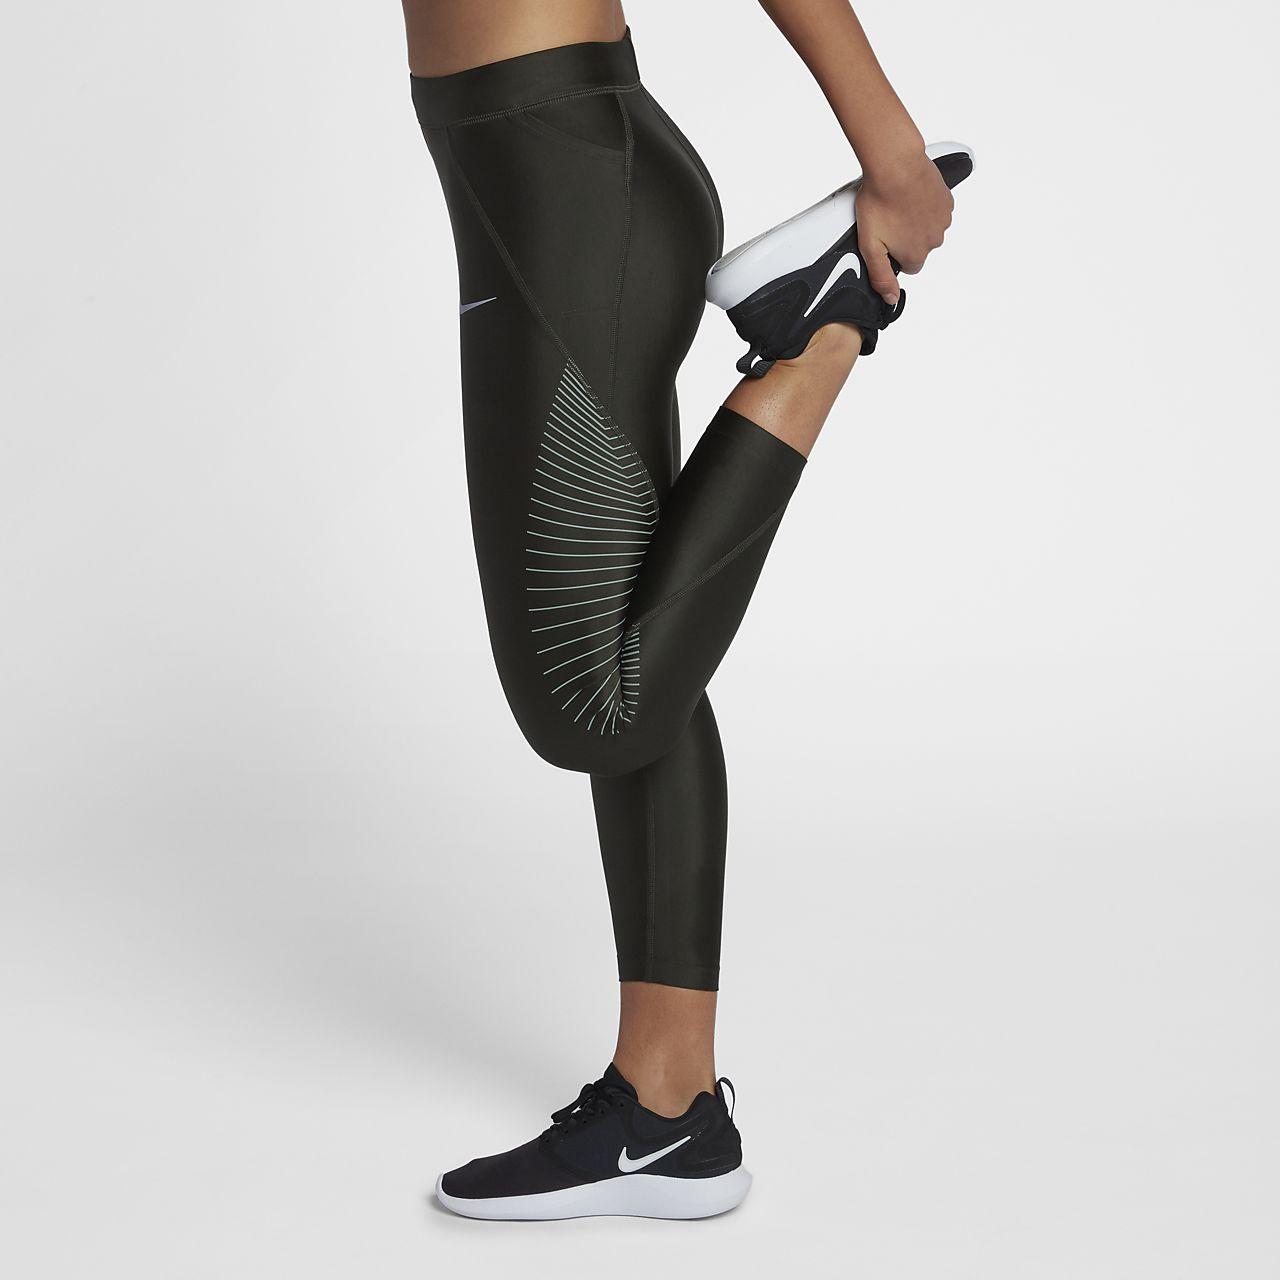 nike speed women 39 s running tights. Black Bedroom Furniture Sets. Home Design Ideas